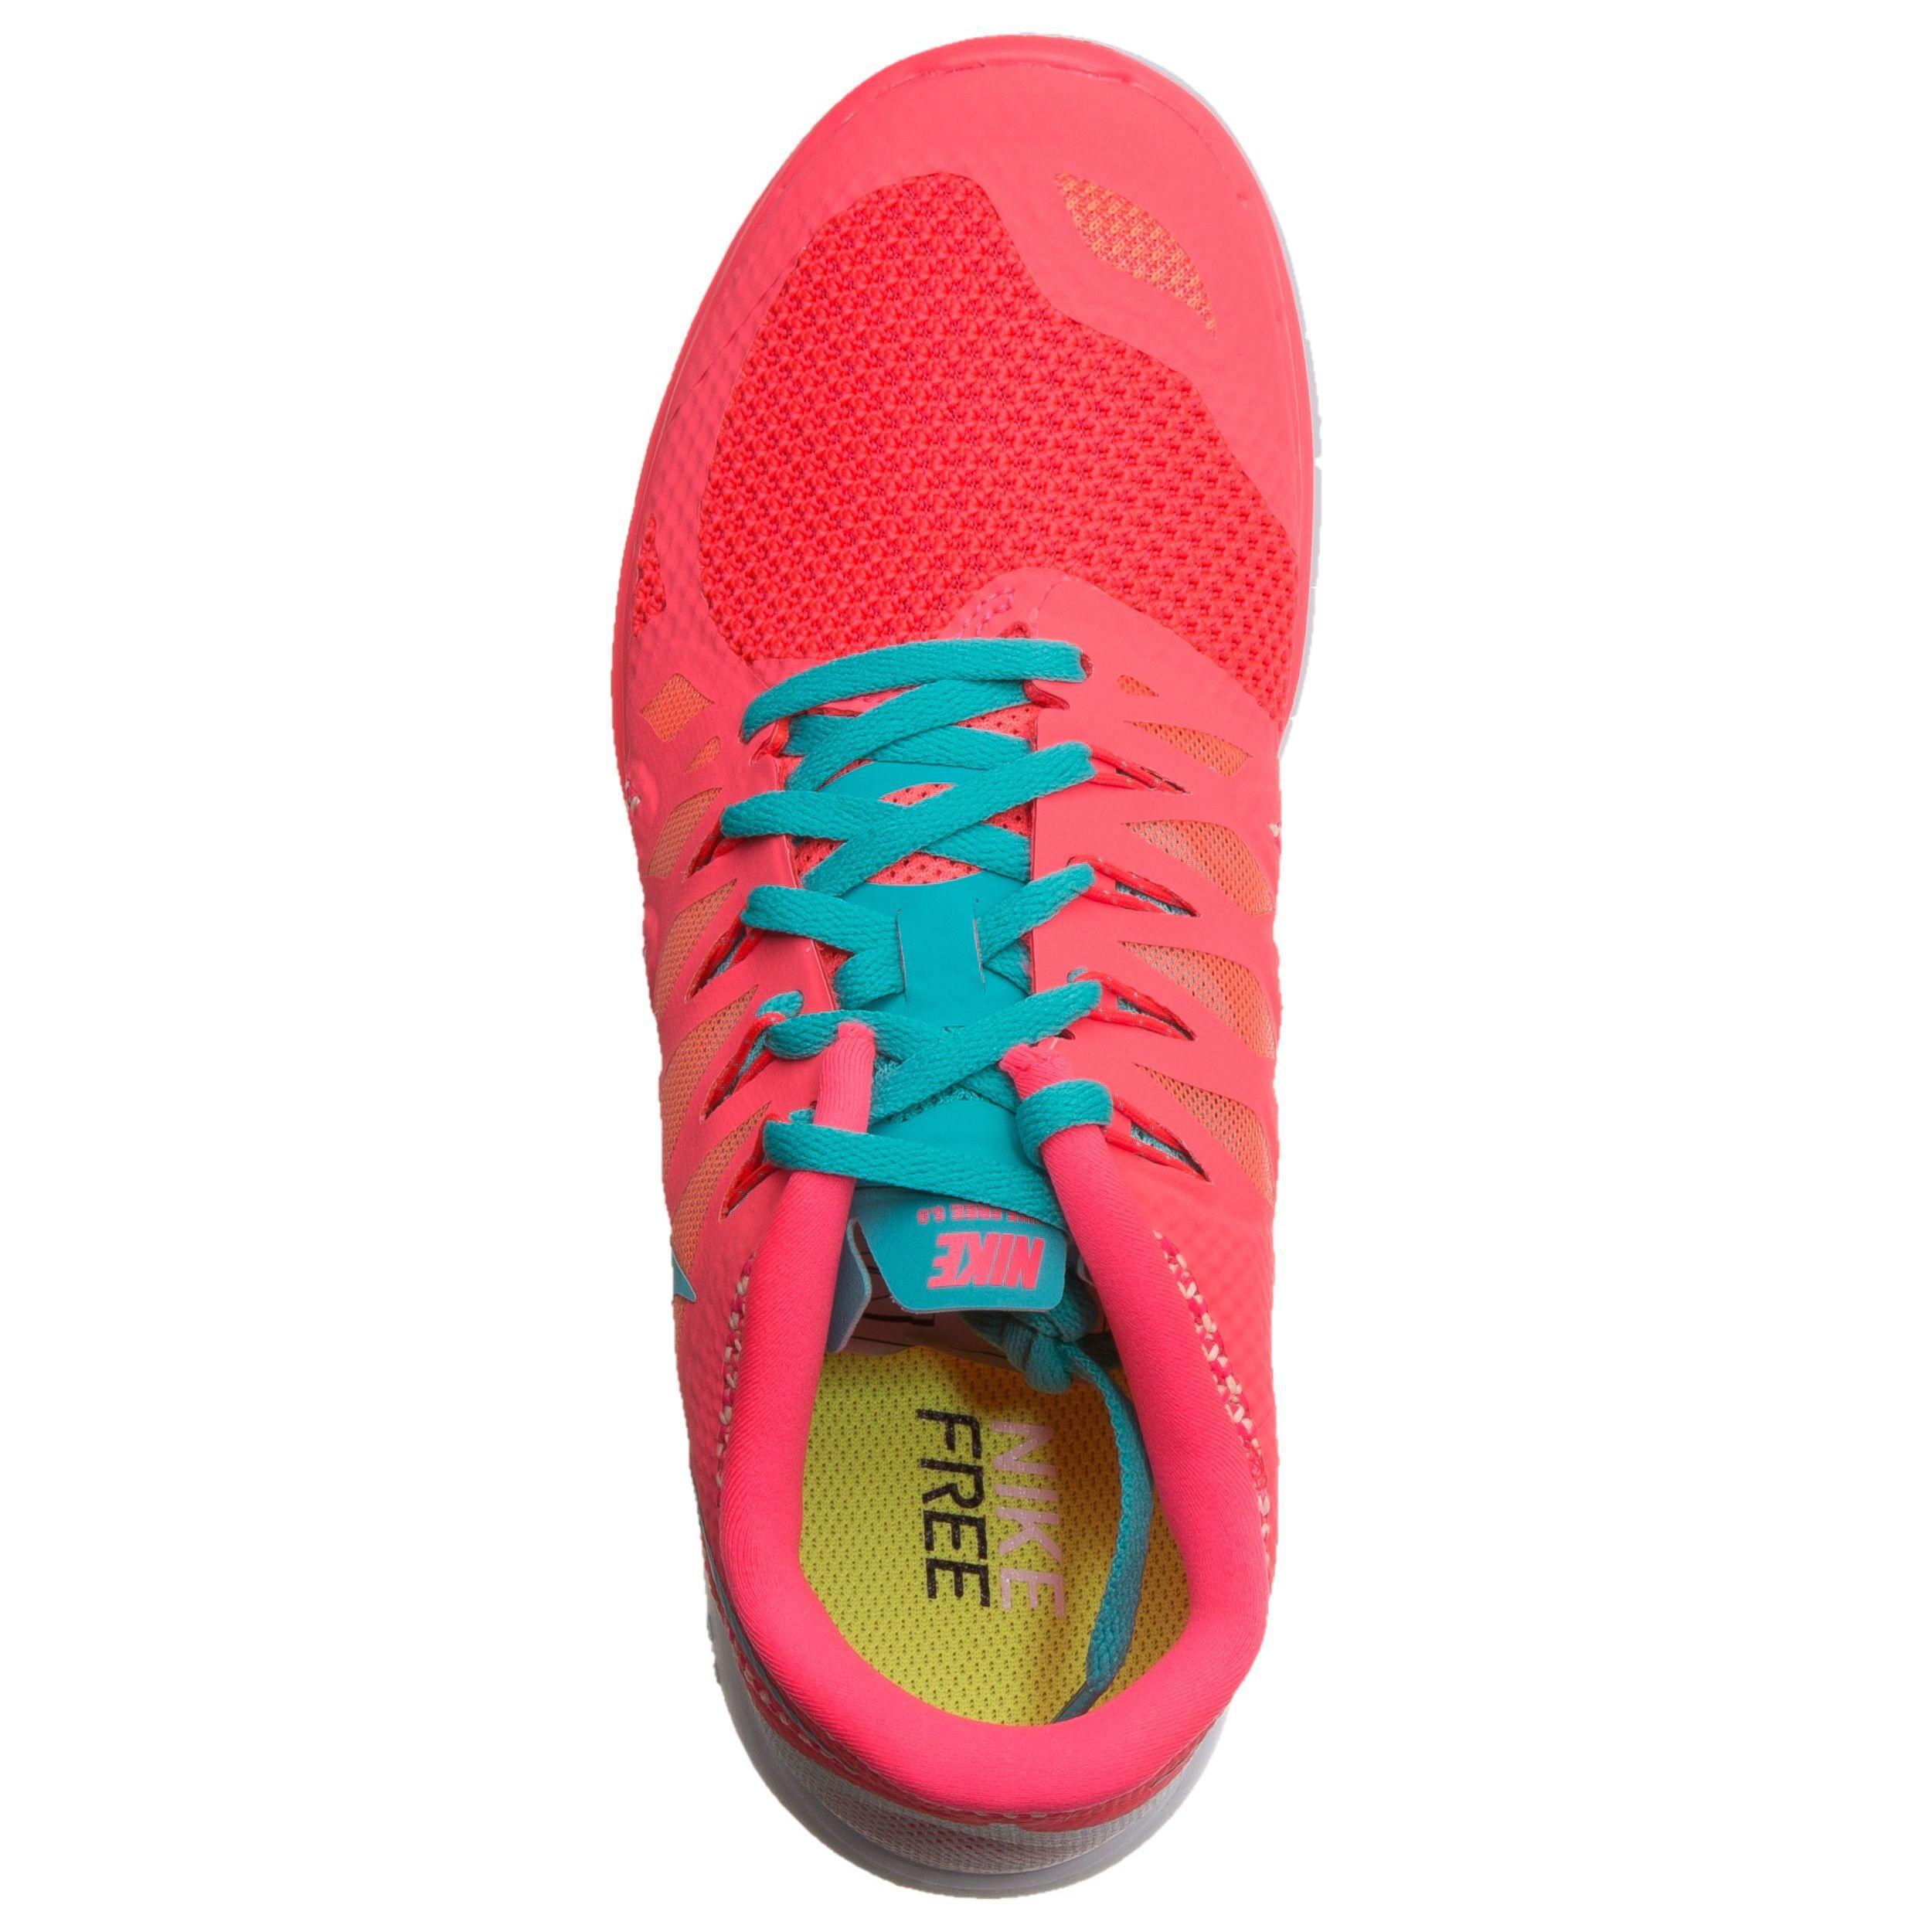 Nike Free 5.0+ Sneaker Damen Pink, Türkis online kaufen